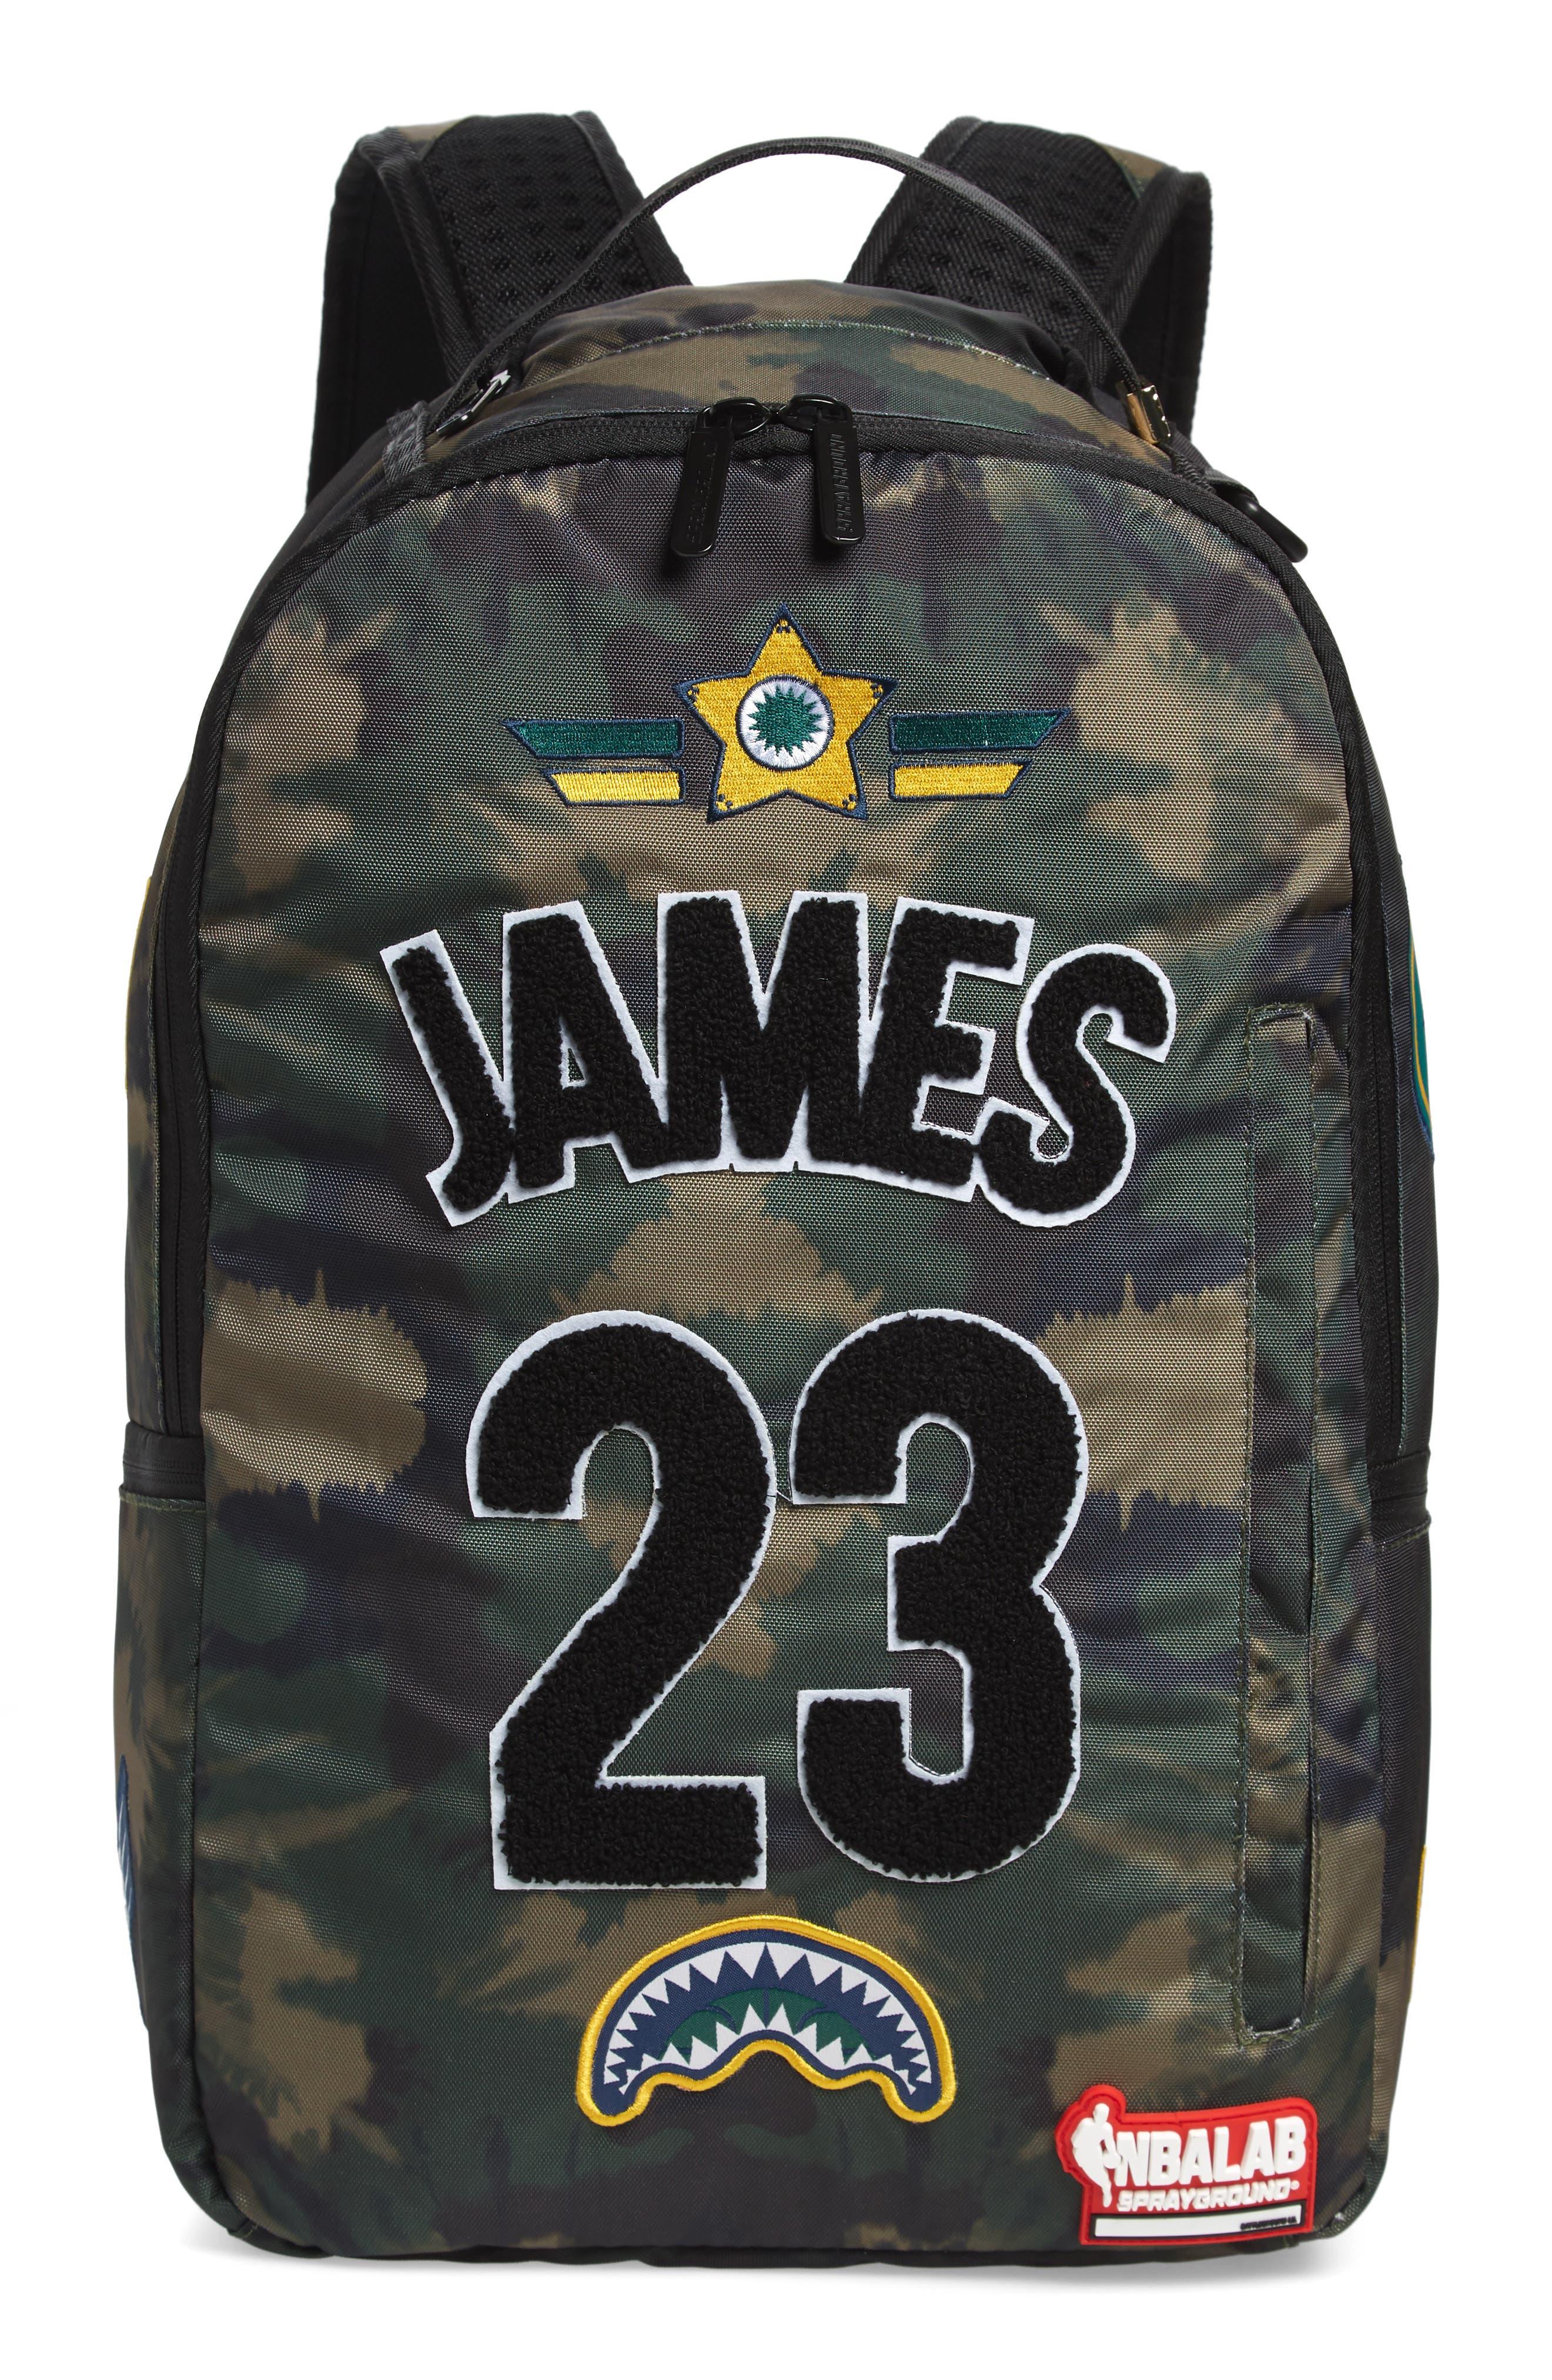 James Tie Dye Backpack,                             Main thumbnail 1, color,                             TIE DYE